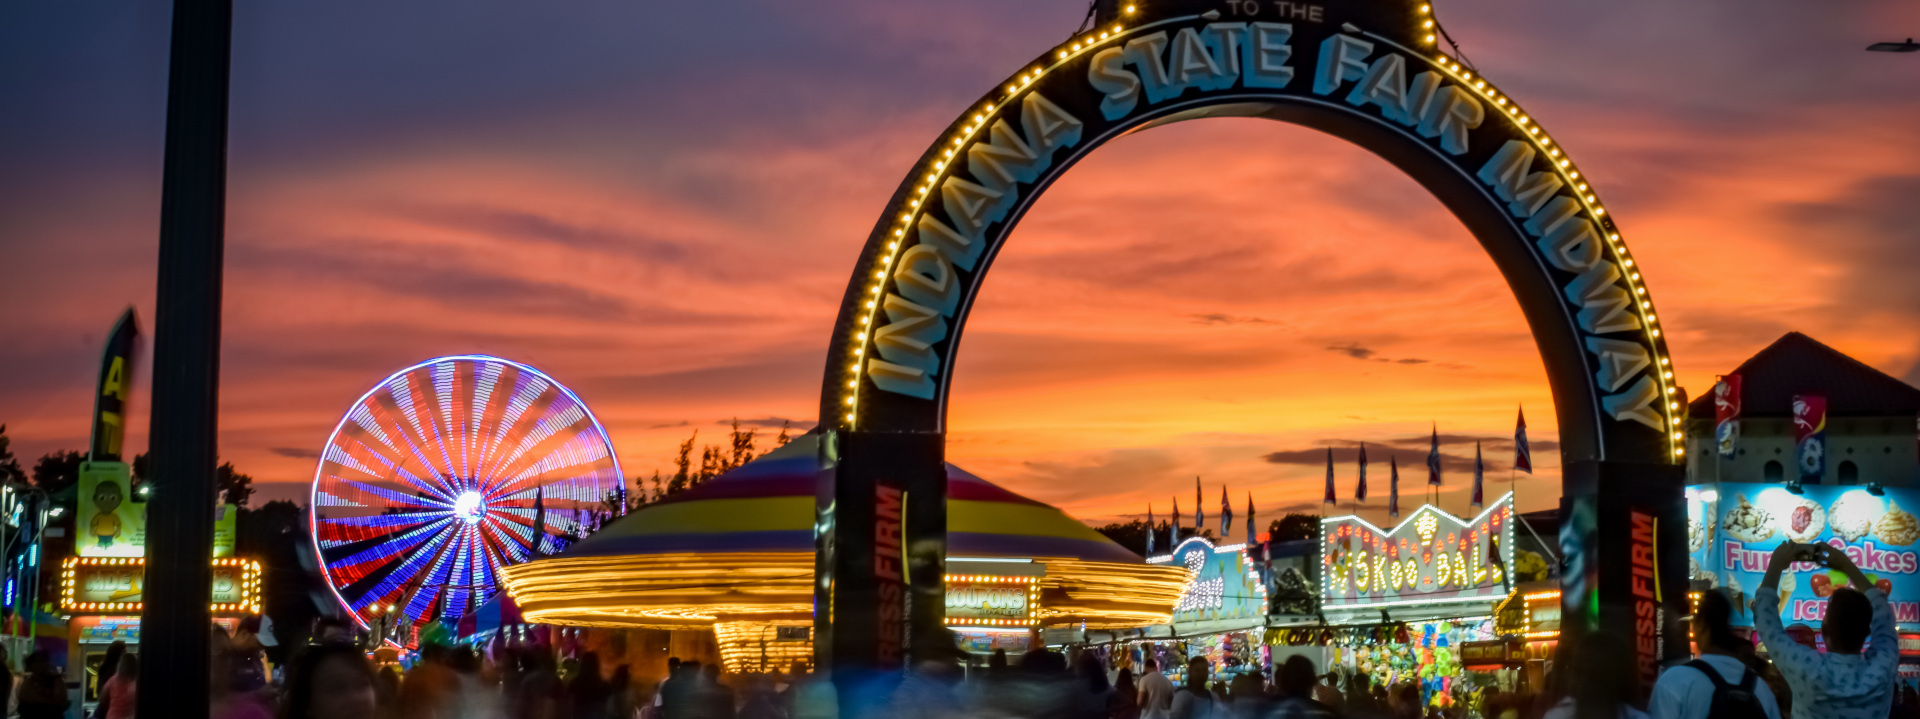 Indiana State Fairgrounds & Event Center - Memories happen